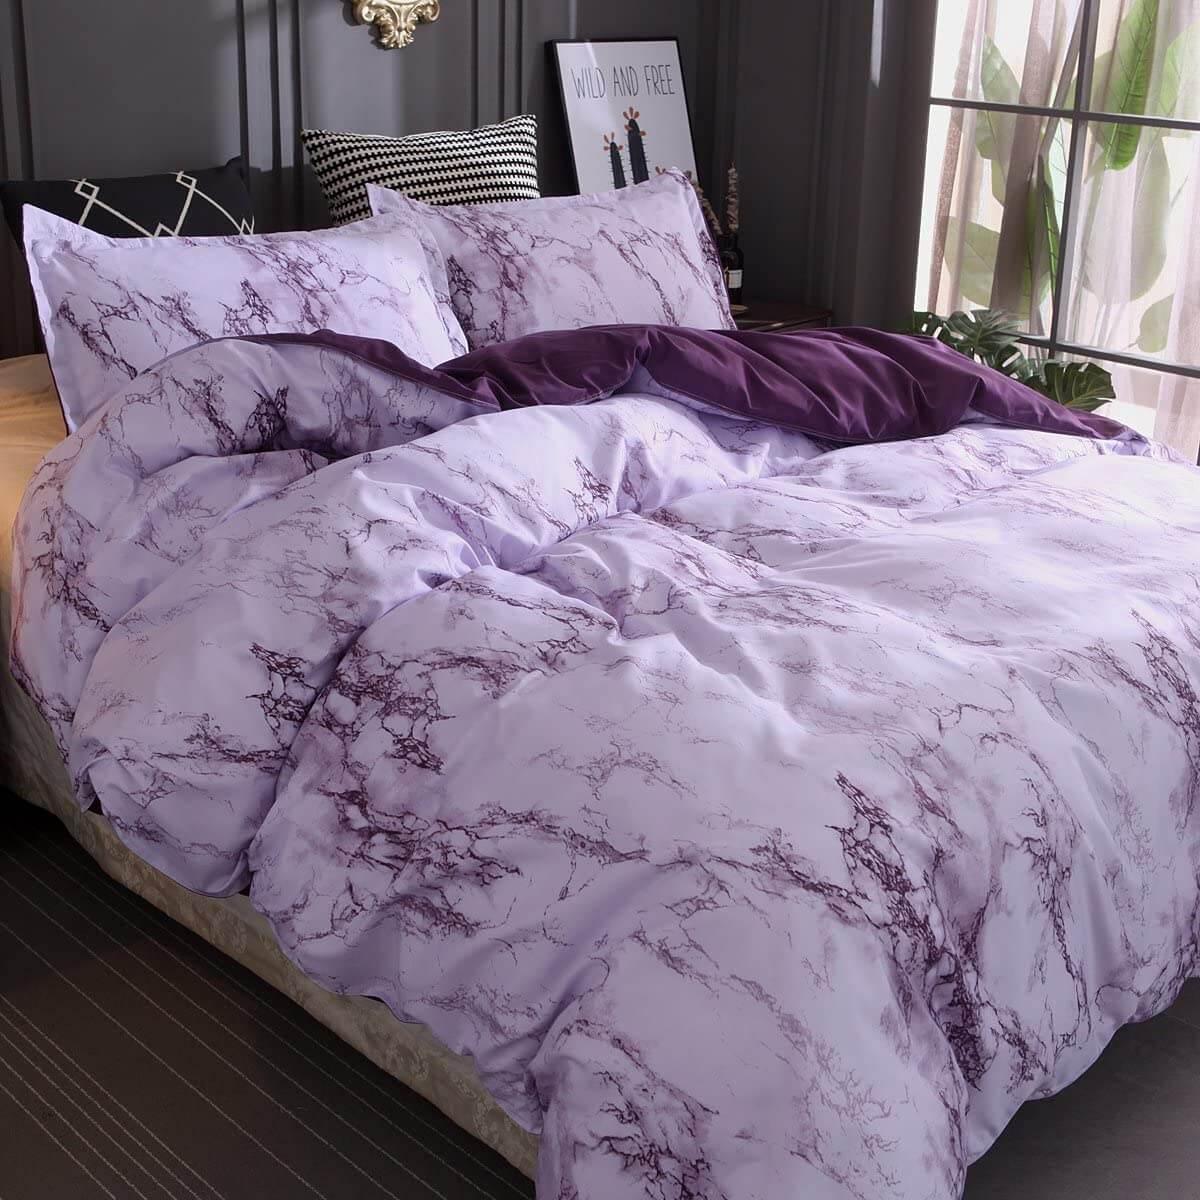 Soft Microfiber Duvet Bedding Set for Everyone